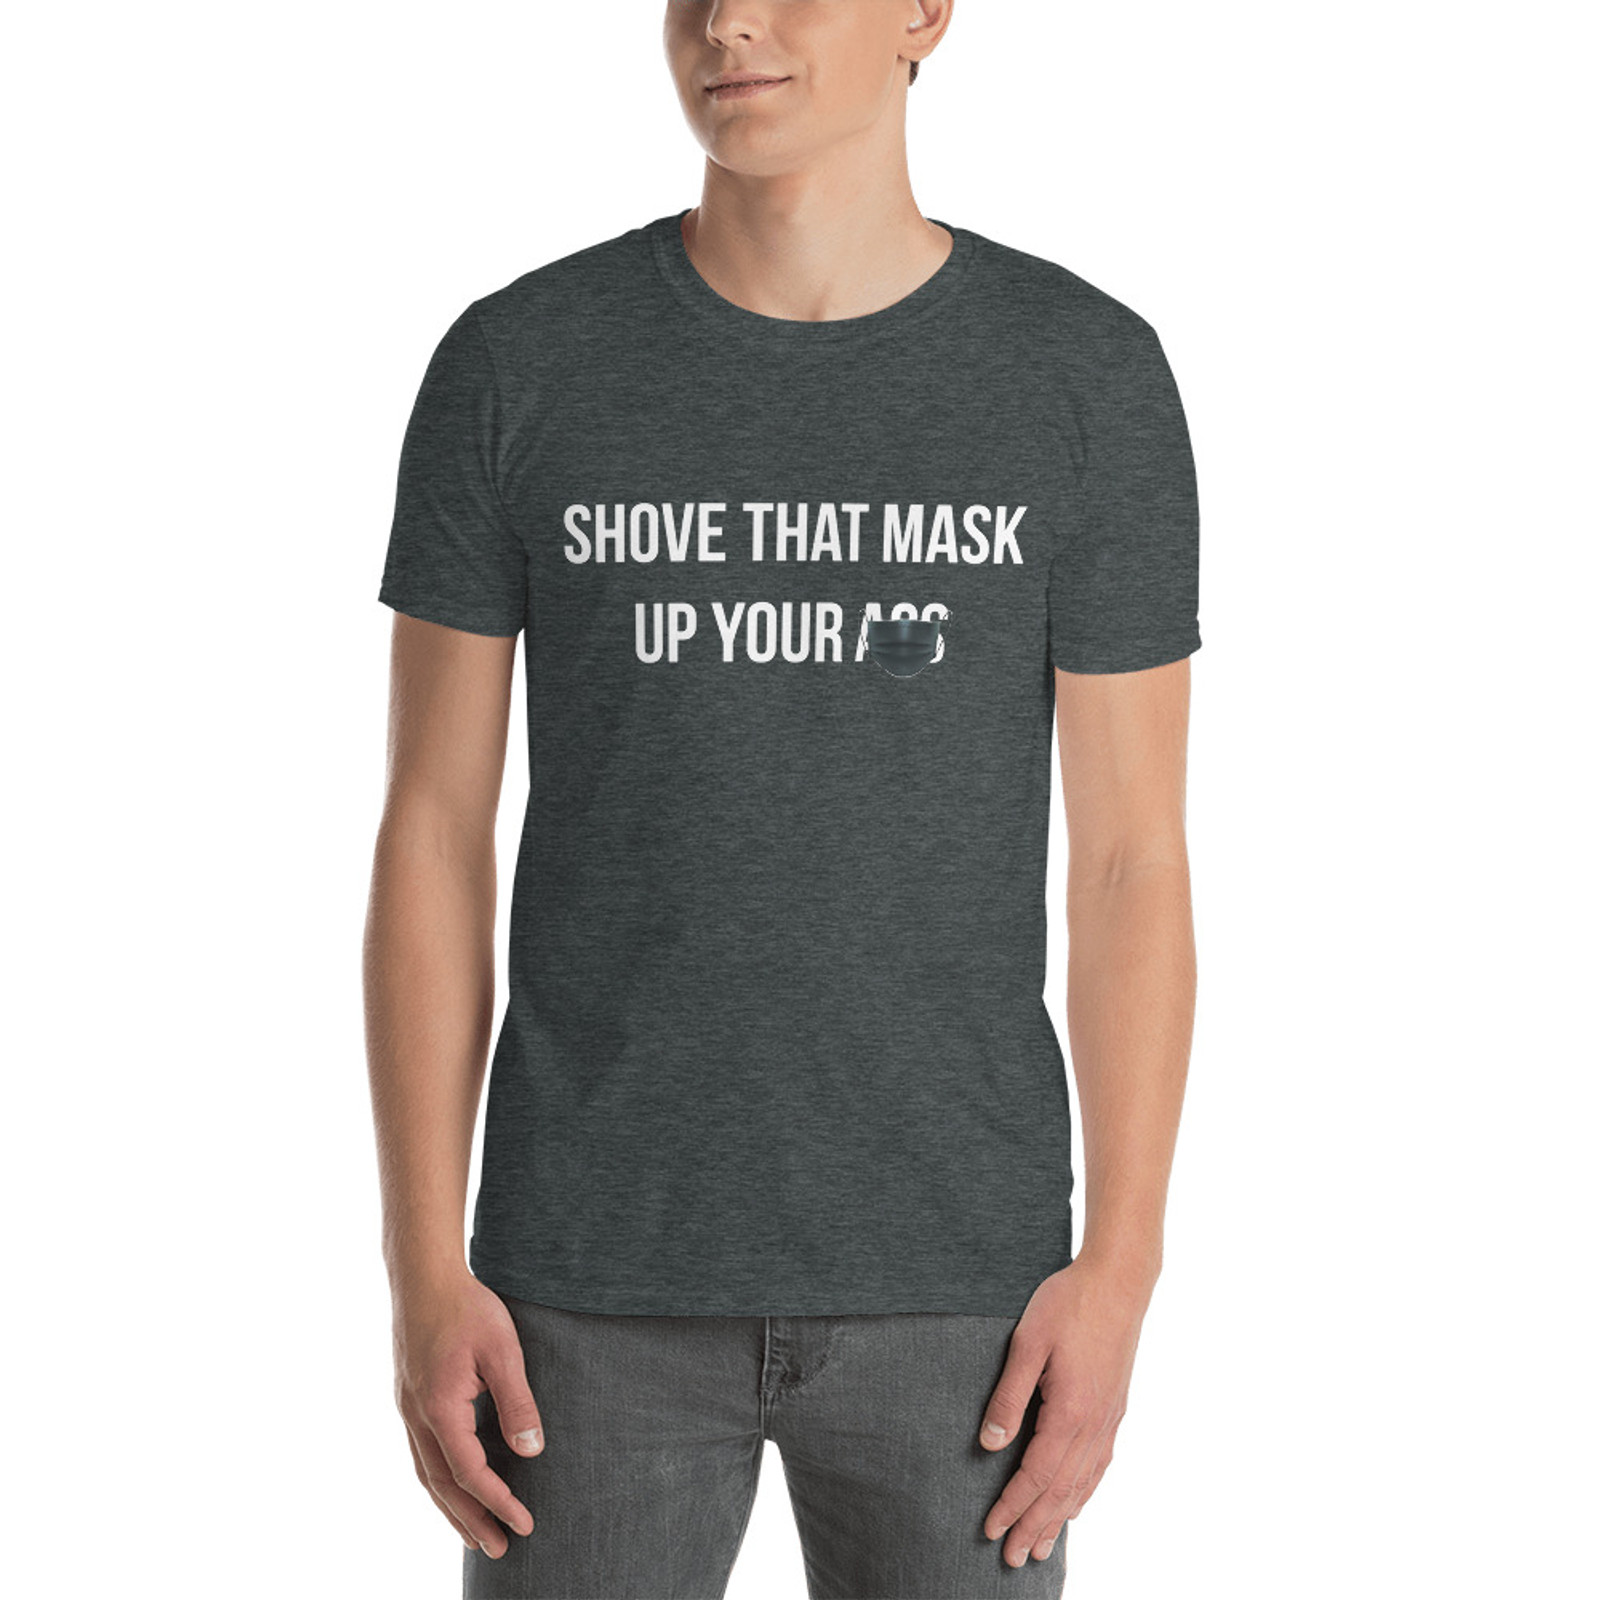 Shove That Mask T-Shirt